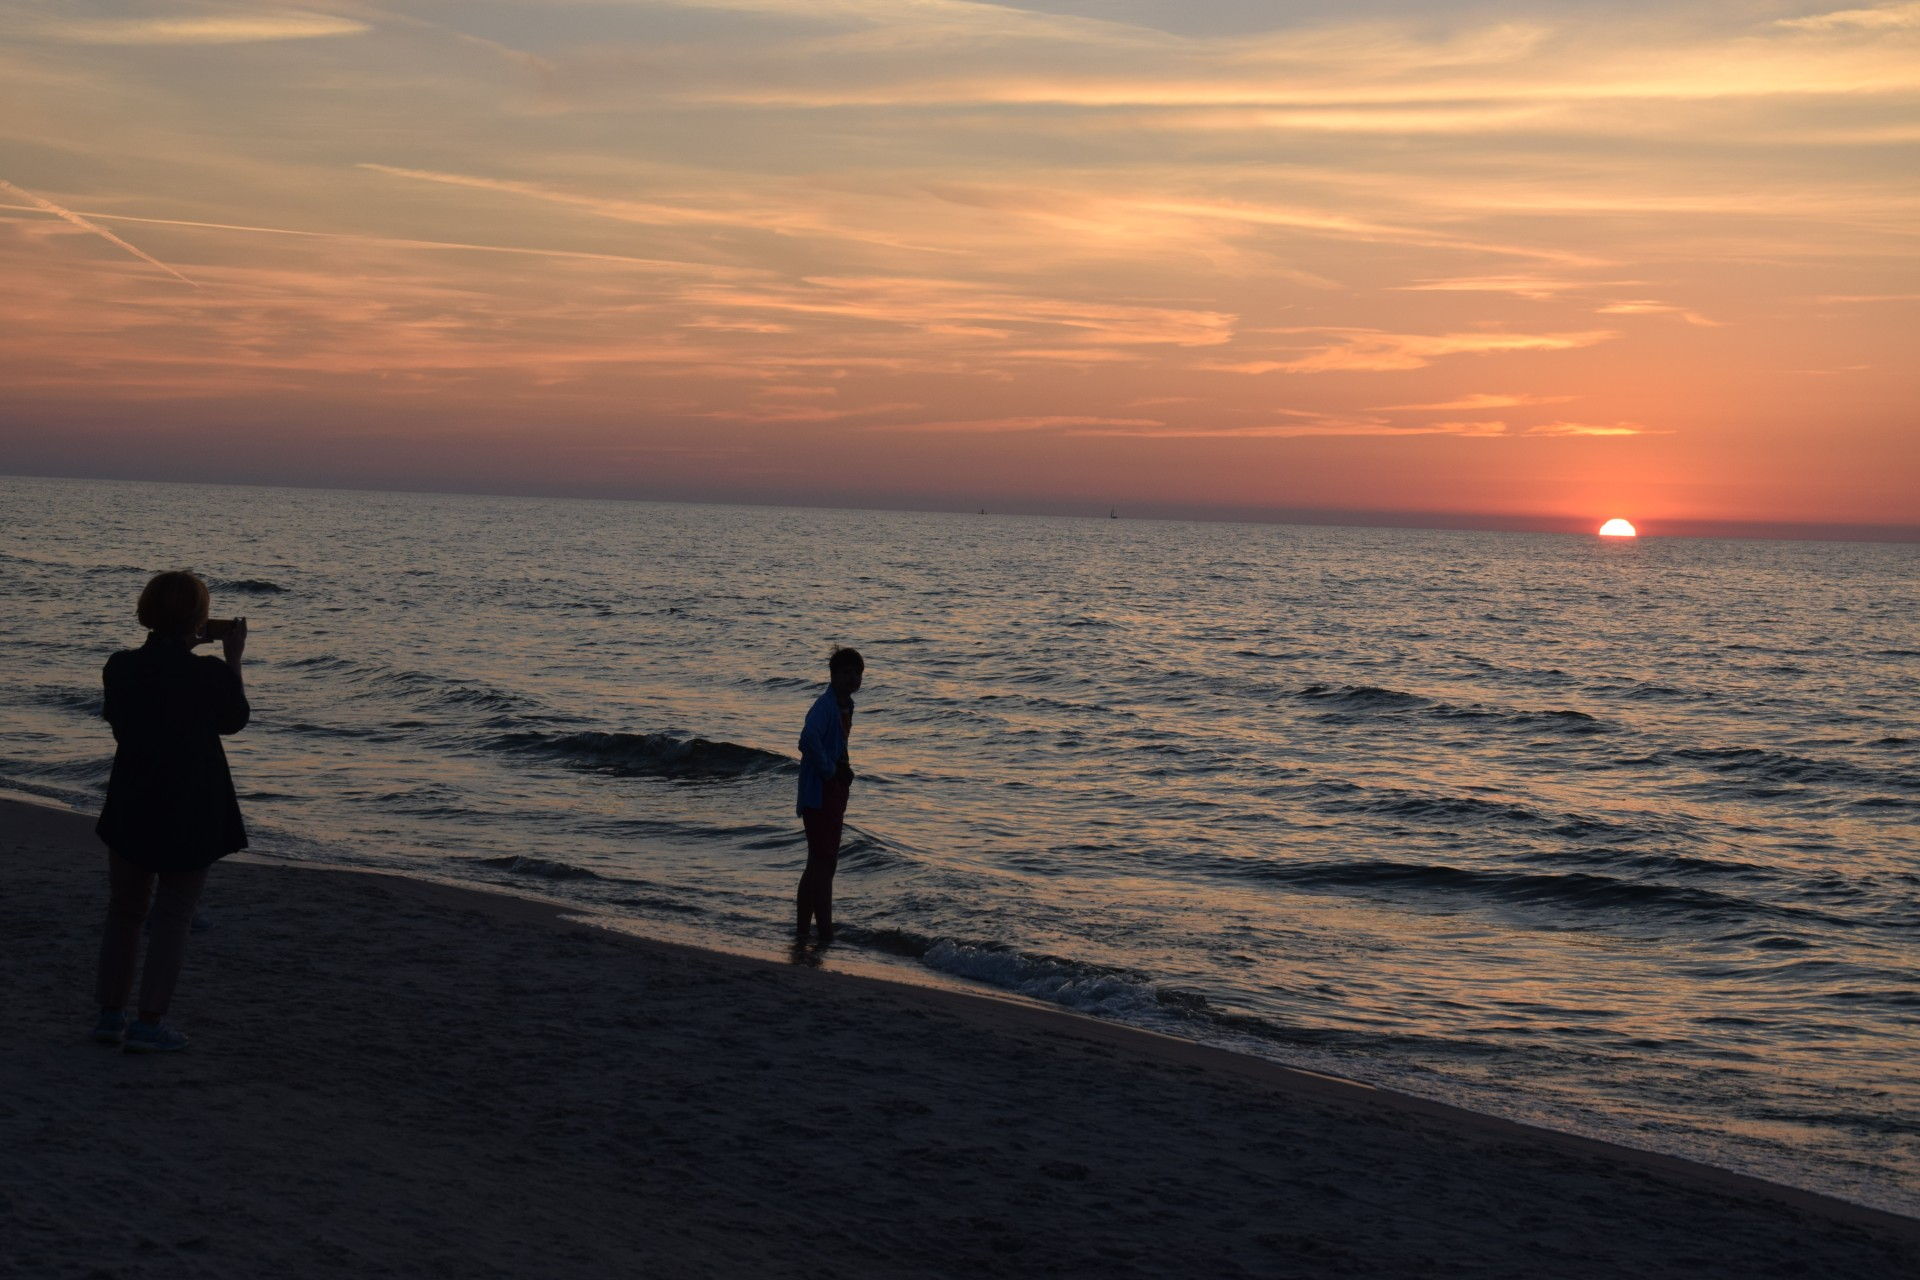 Kopalino, plaża. Nieopowiedziane historie [FOTOREPORTAŻ] 11